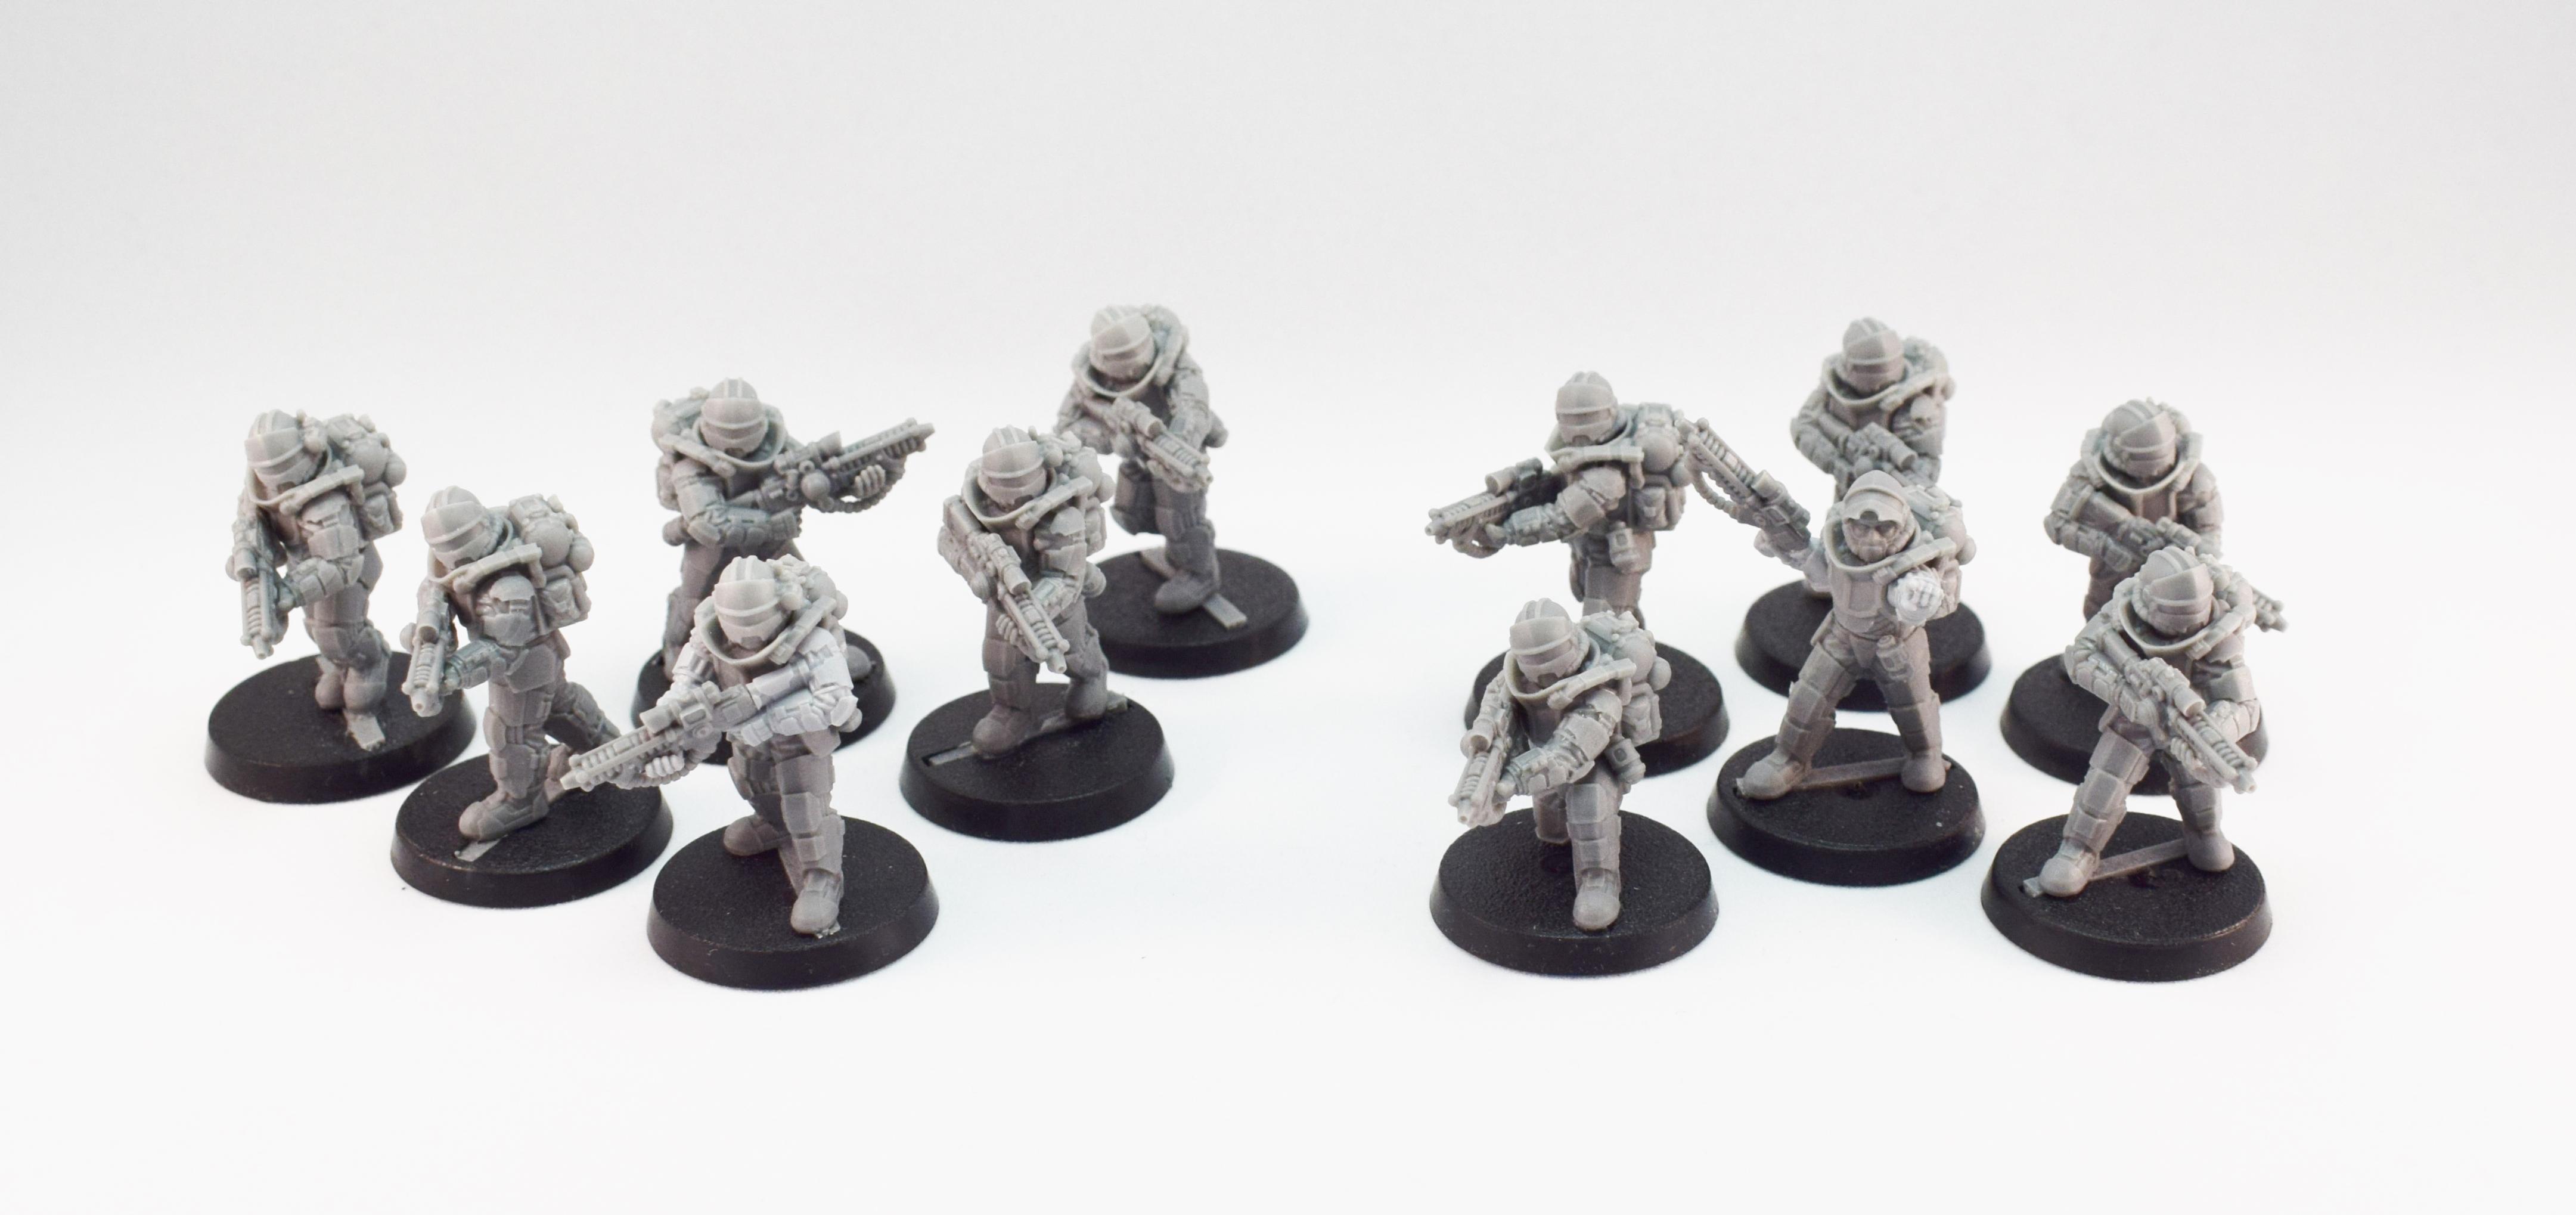 Adeptus Mechanics, Anvil Industry, Imperial Guard, Martian Orbital Fusiliers, Mechanics, Regiments